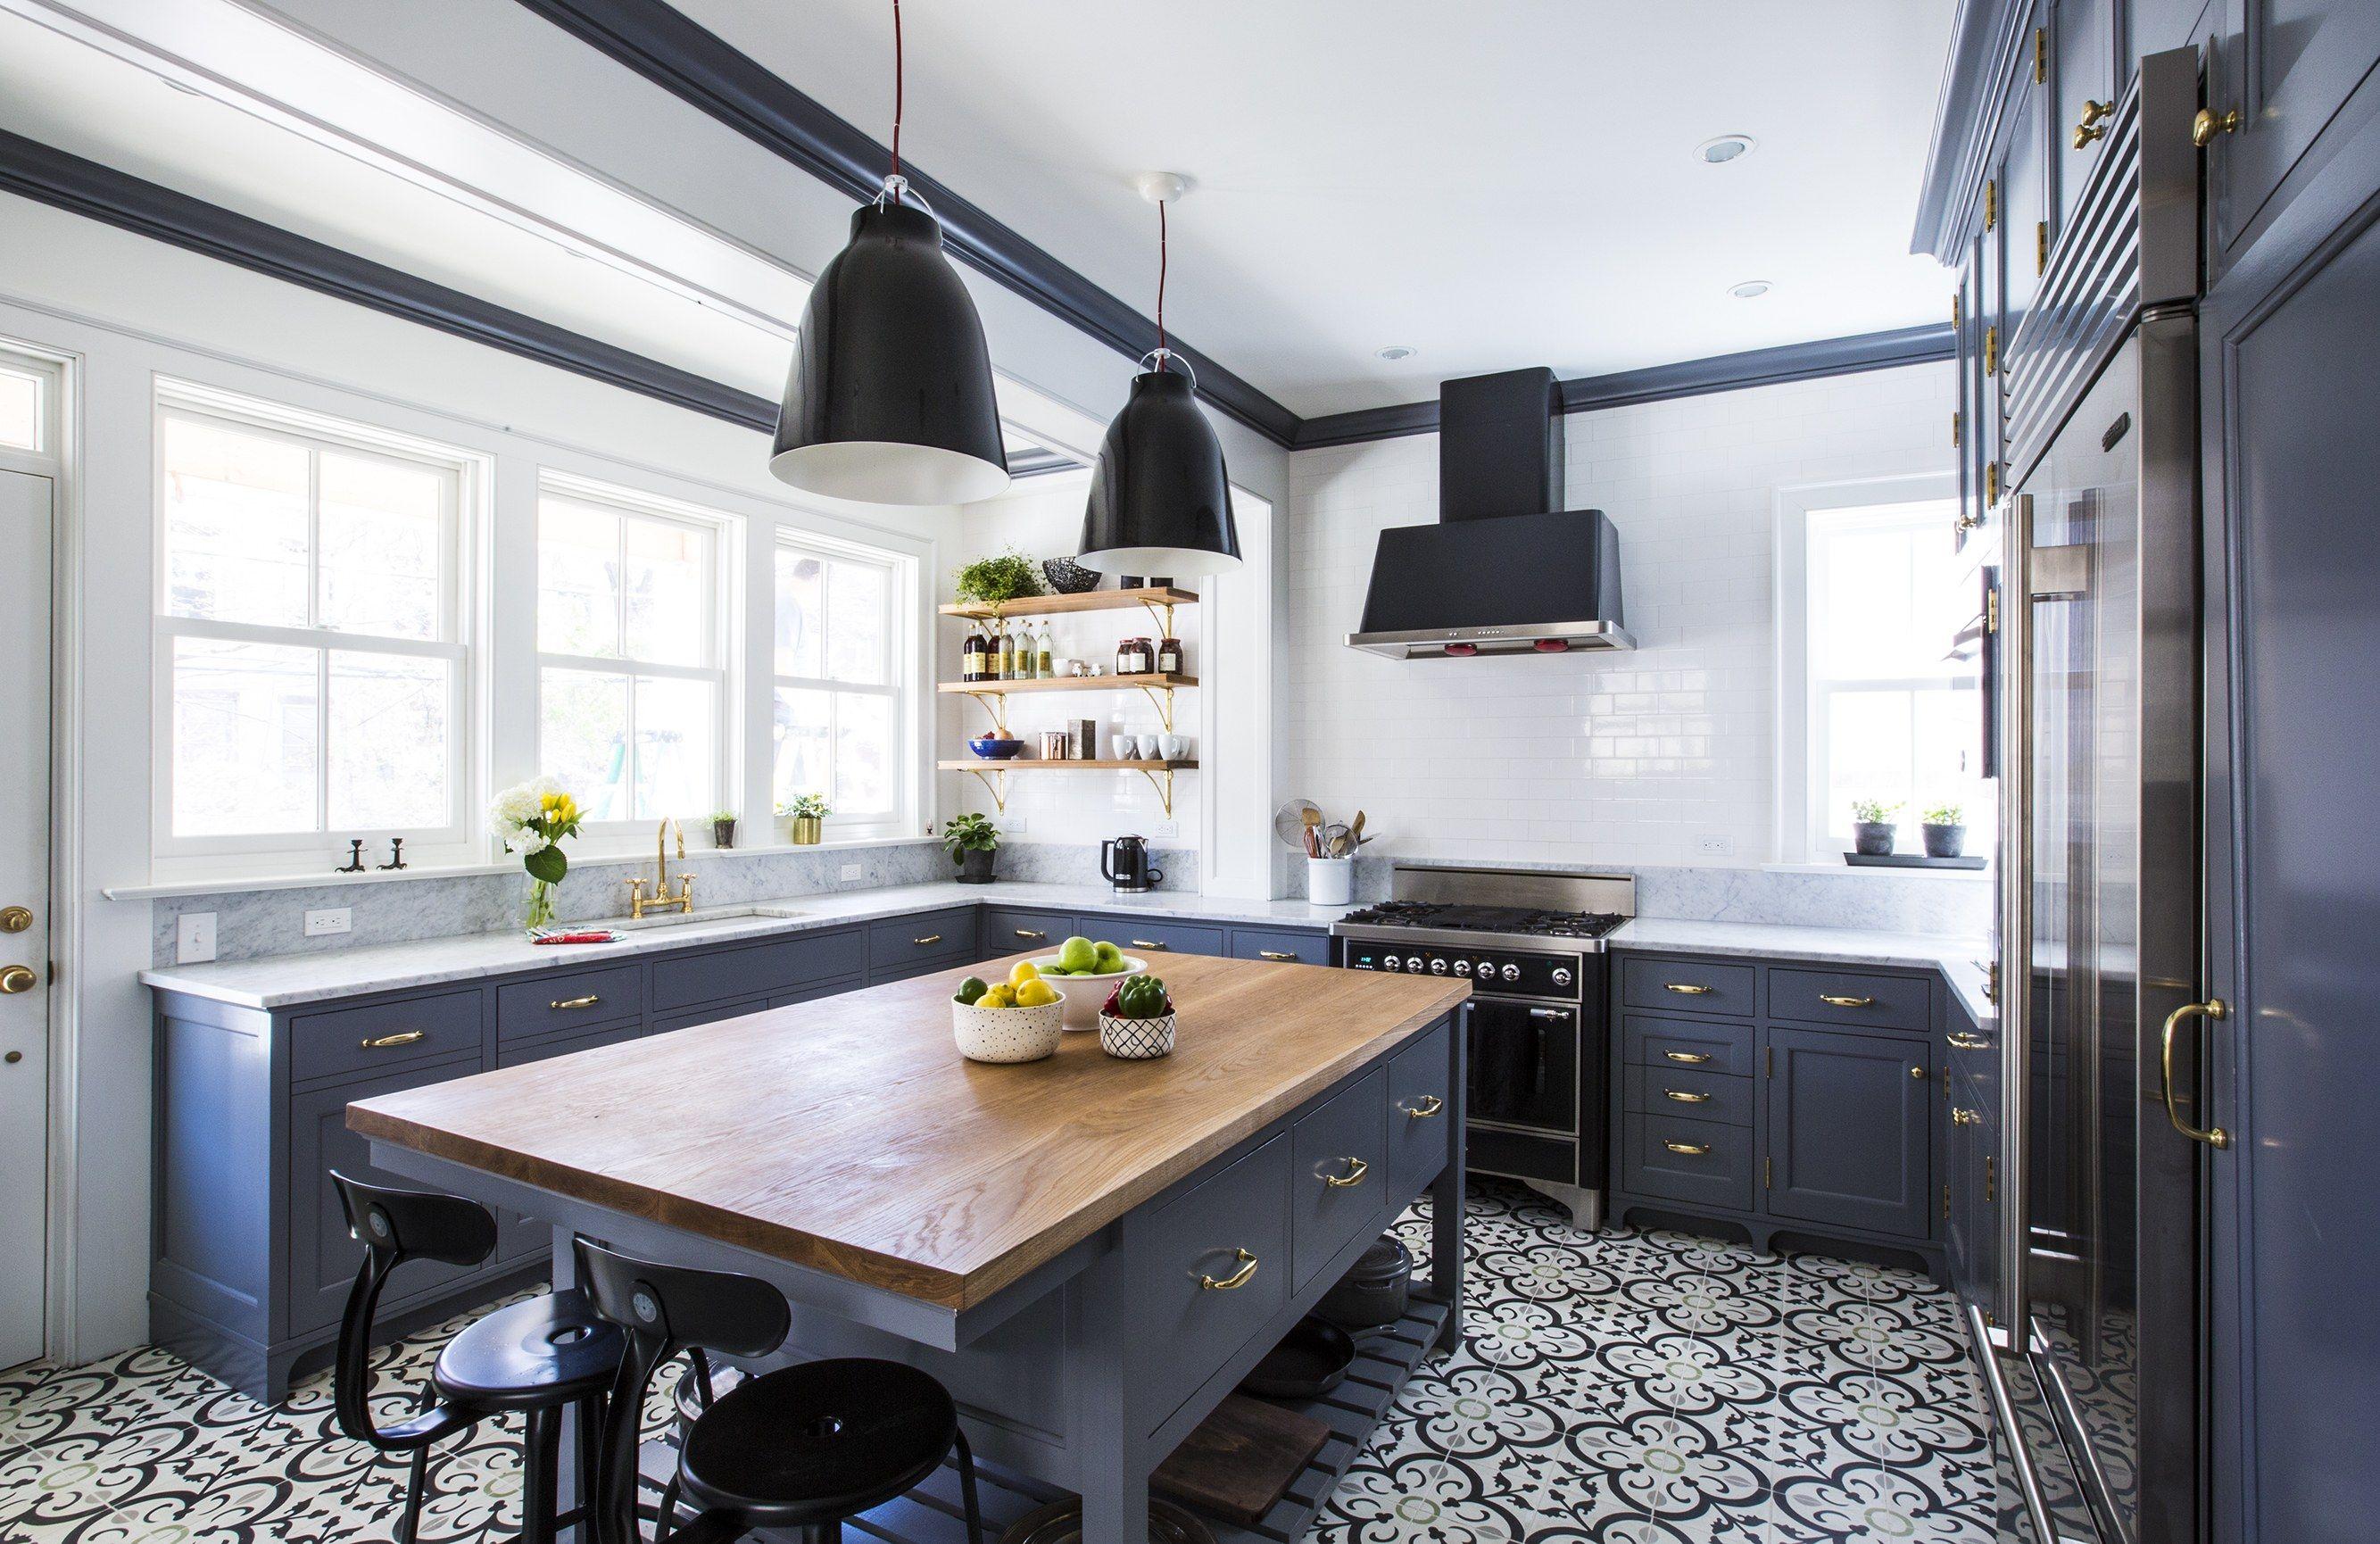 253 best kitchen images on pinterest contemporary kitchen